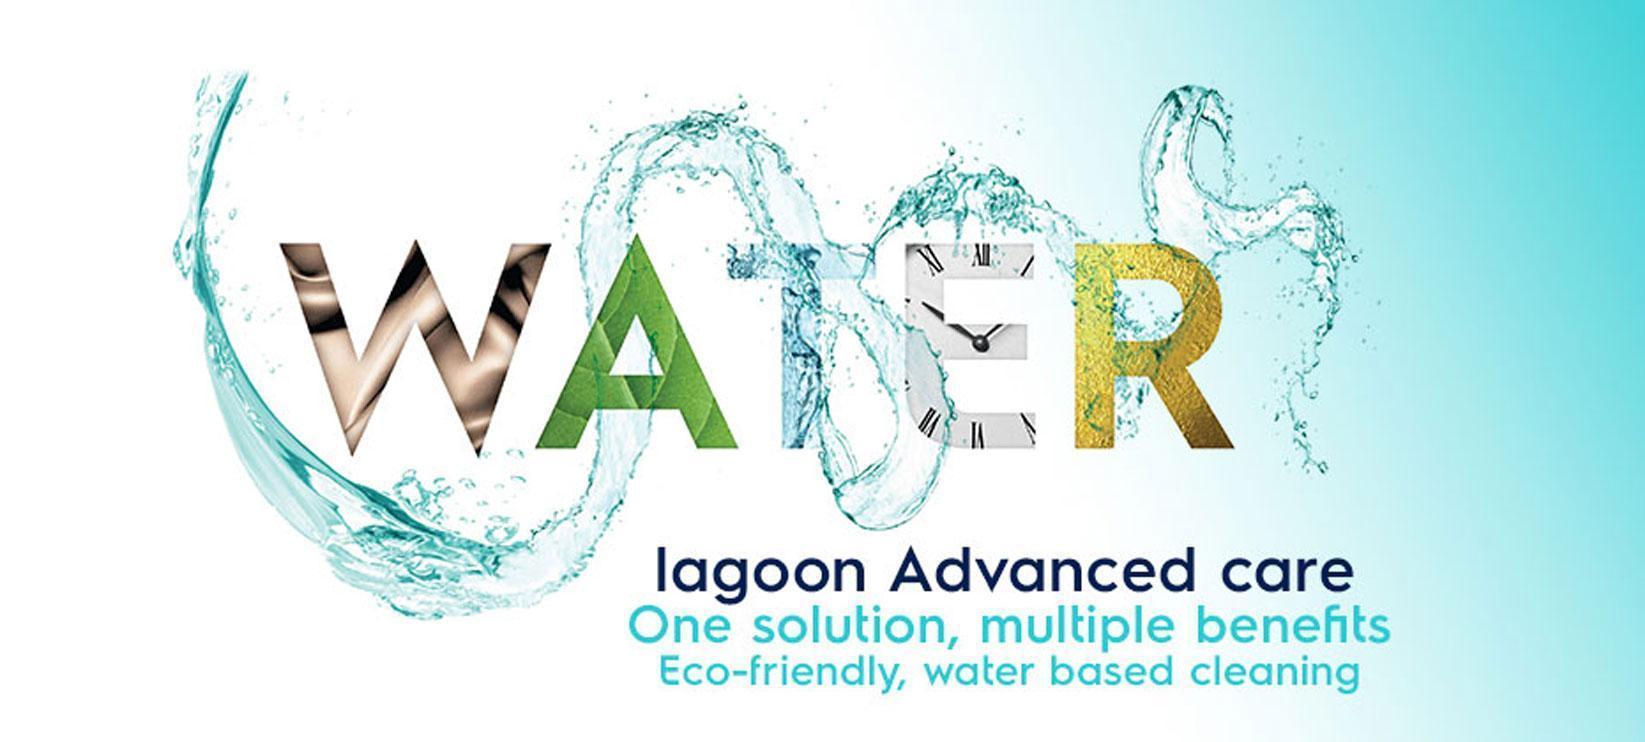 Lagoon-Advanced-Care